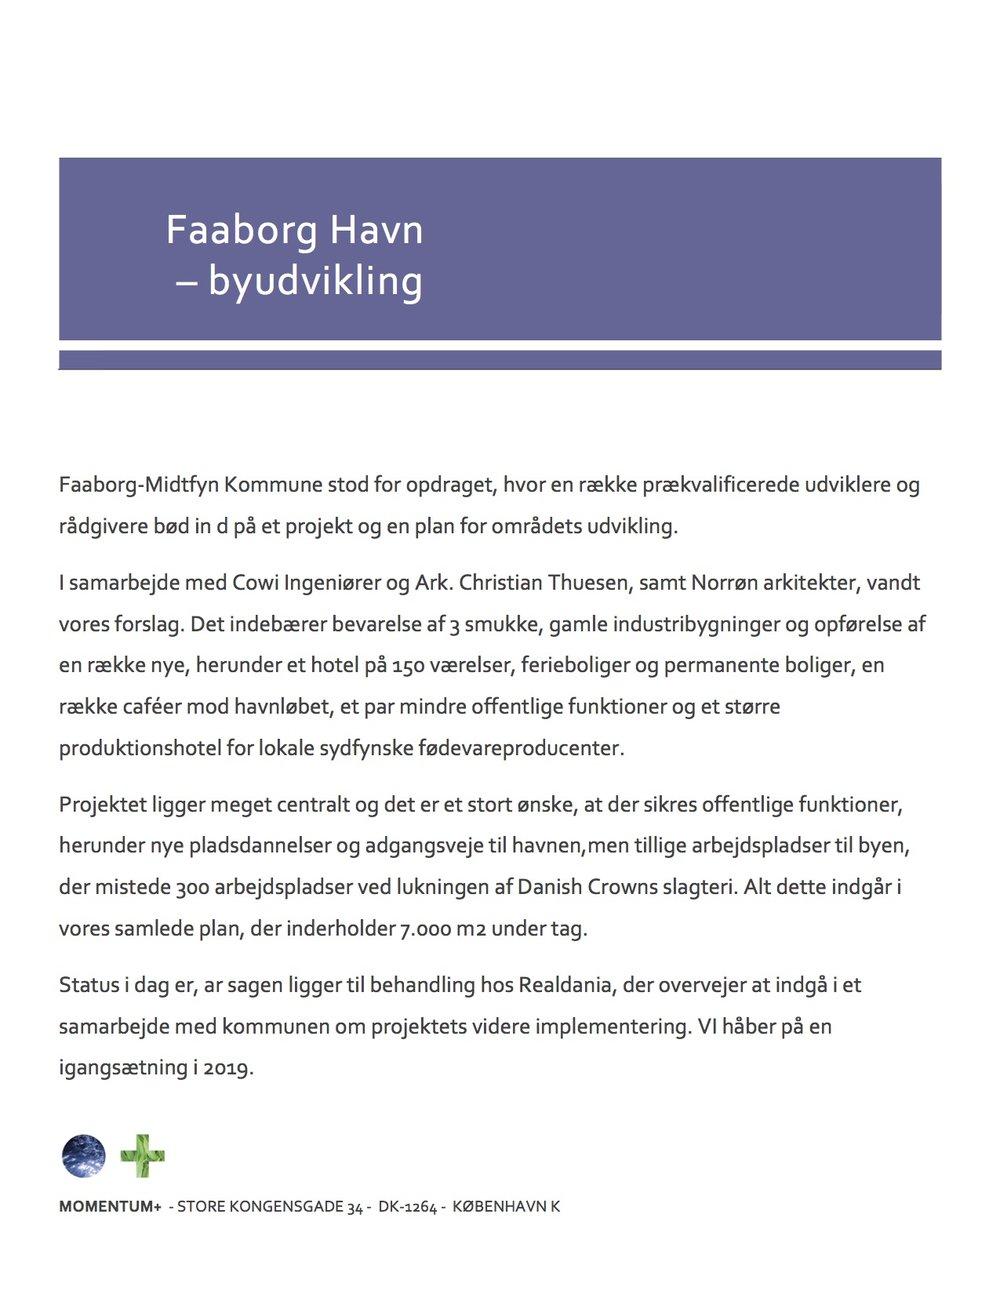 Faaborg Havn - 10 ref. -2 .jpg